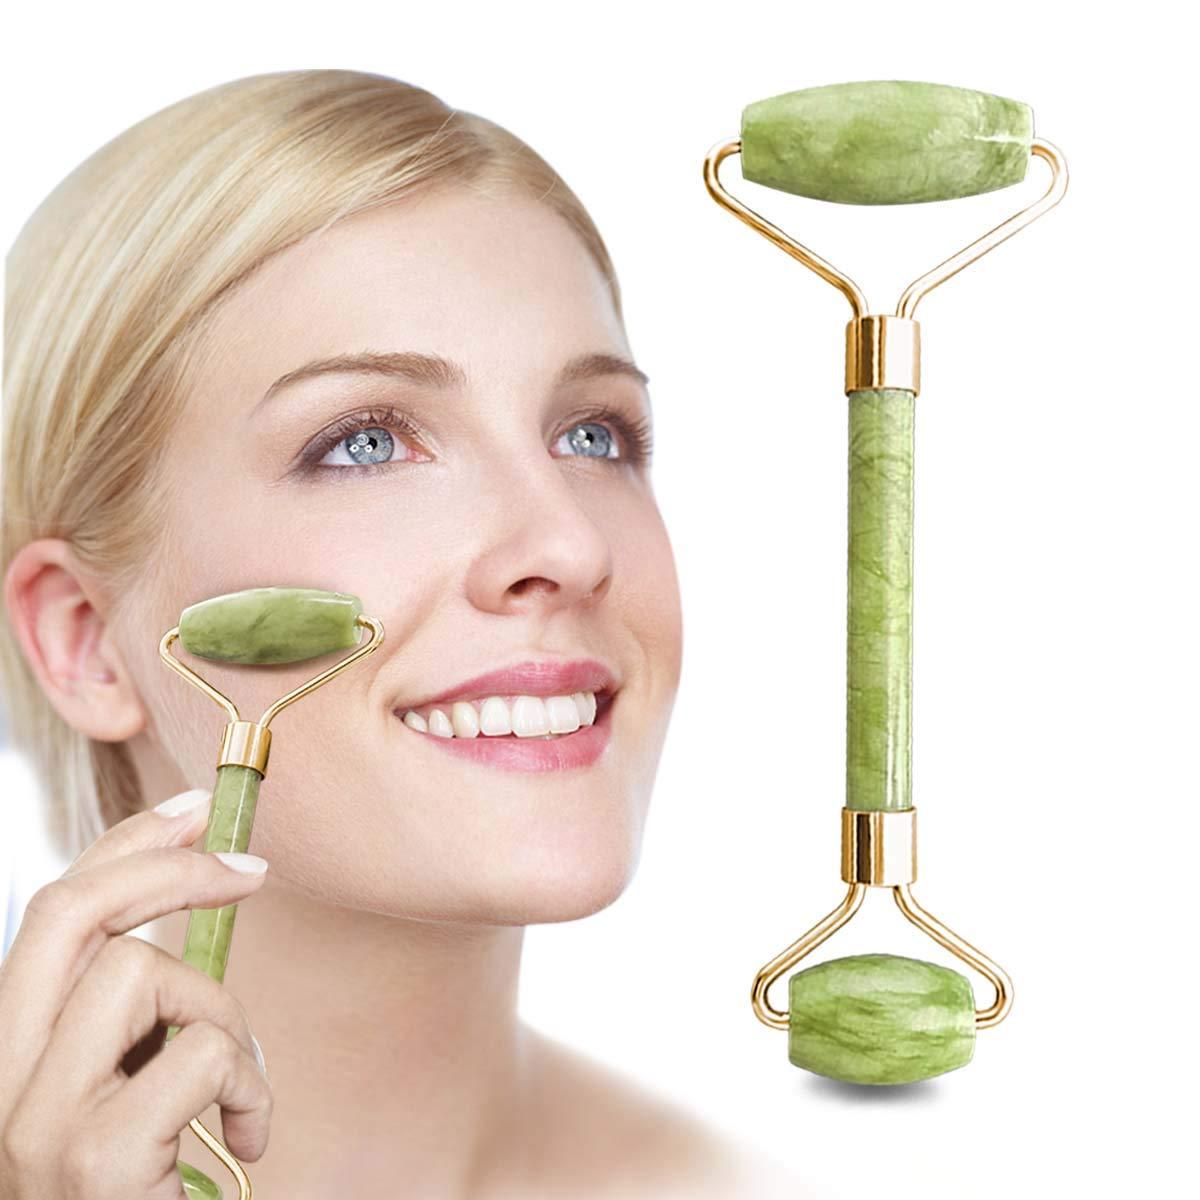 Jade Roller, Jade Roller for Face, Jade Facial Roller, 100% Natural Quartz Facial Roller Anti-aging Massage Roller for Slimming Healing Rejuvenation & Beauty, Neck Healing Slimming Massager (Green) 1